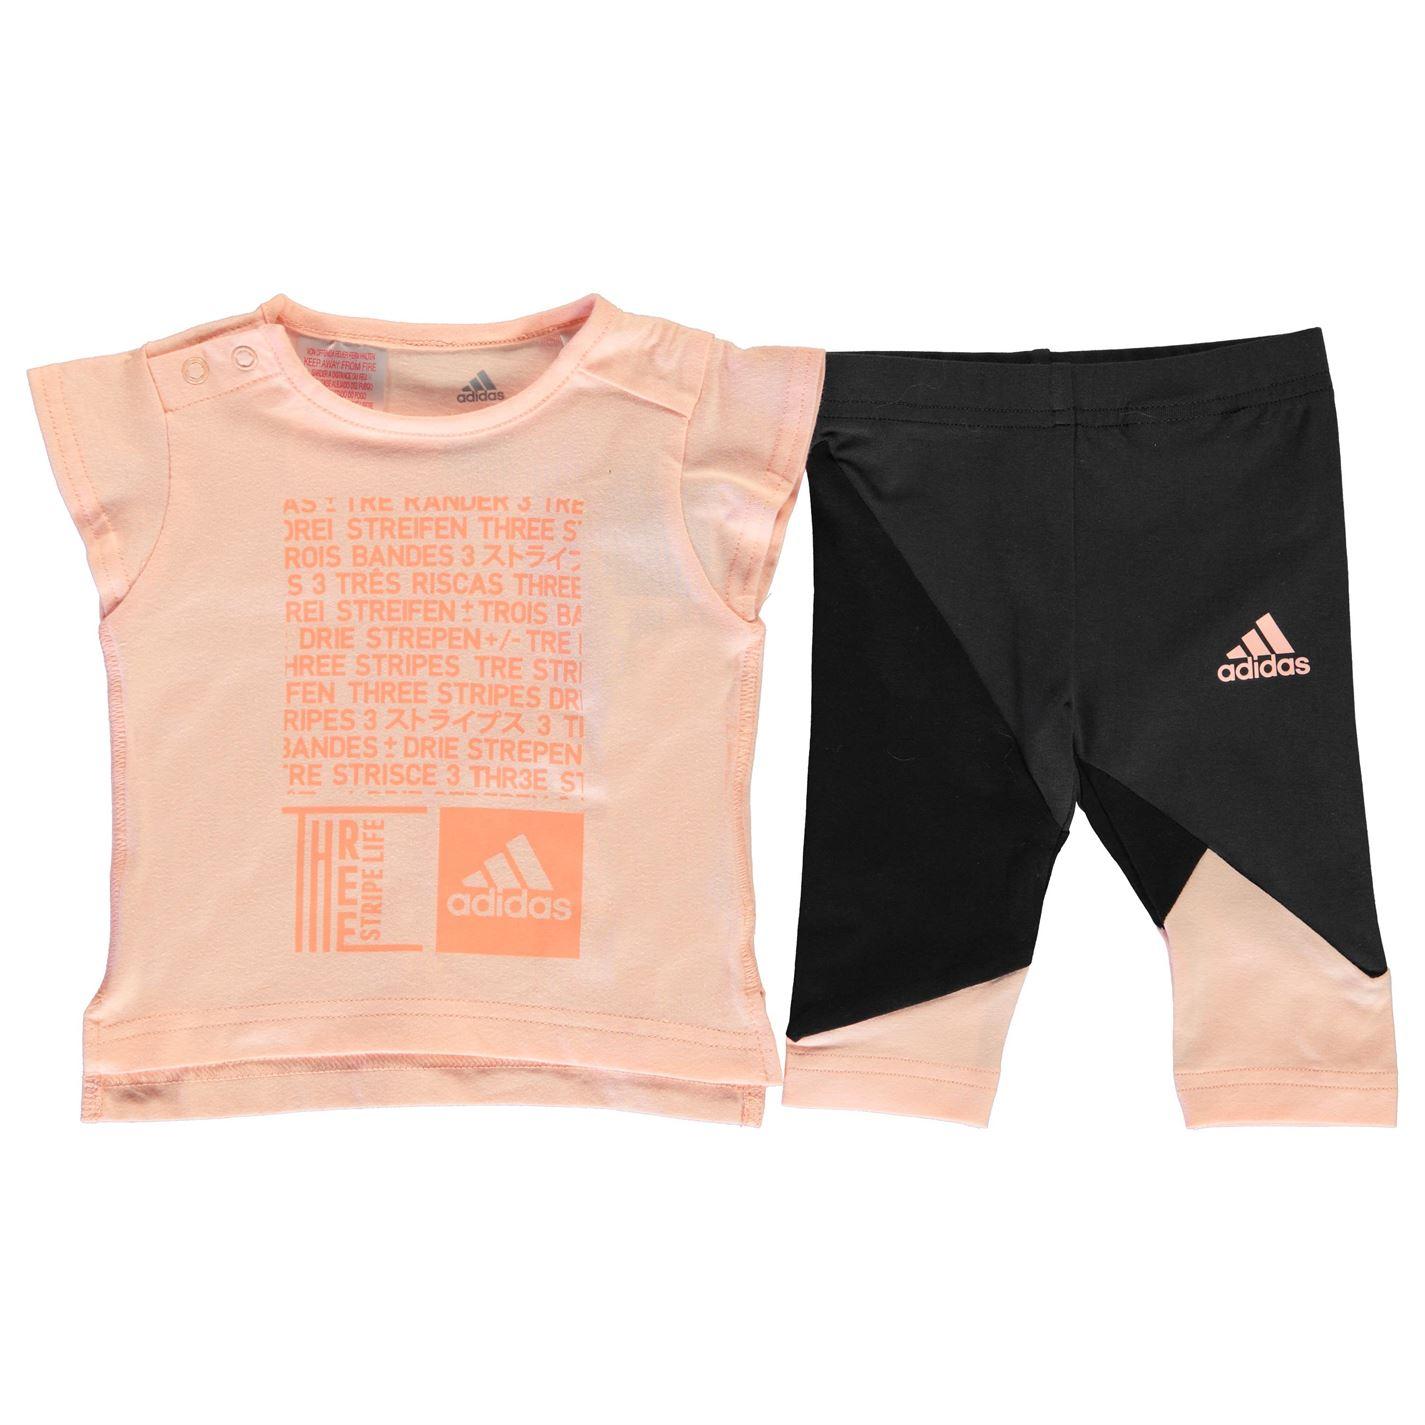 Adidas Print Tee and Tights Set Babies